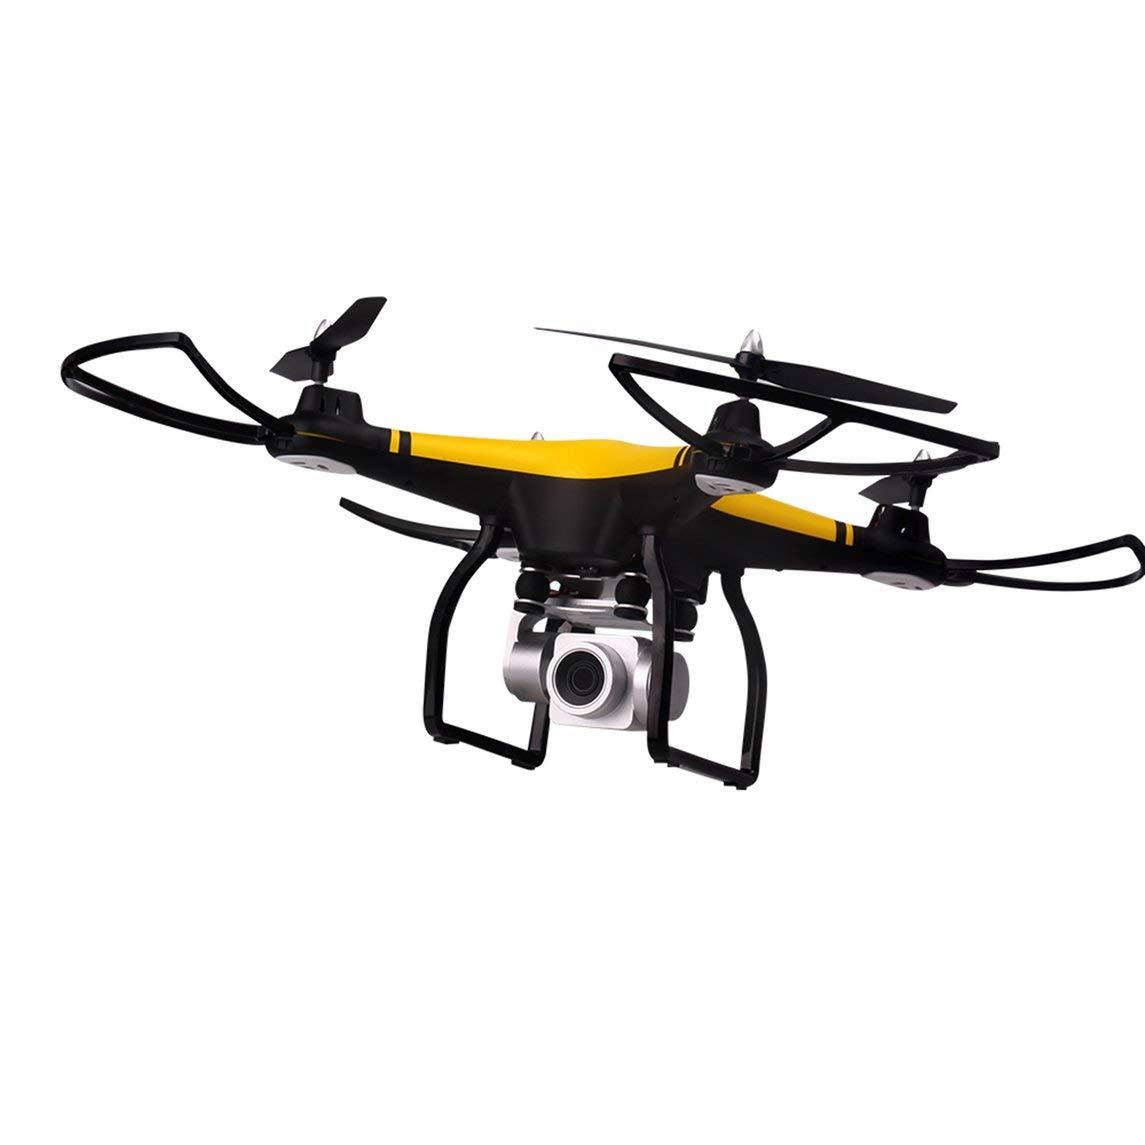 Footprintse 69608 2,4G RC Smart Drone FPV Quadcopter UAV mit mit mit 720P Kamera Höhe Hold-Farbe: gelb 8ba69f